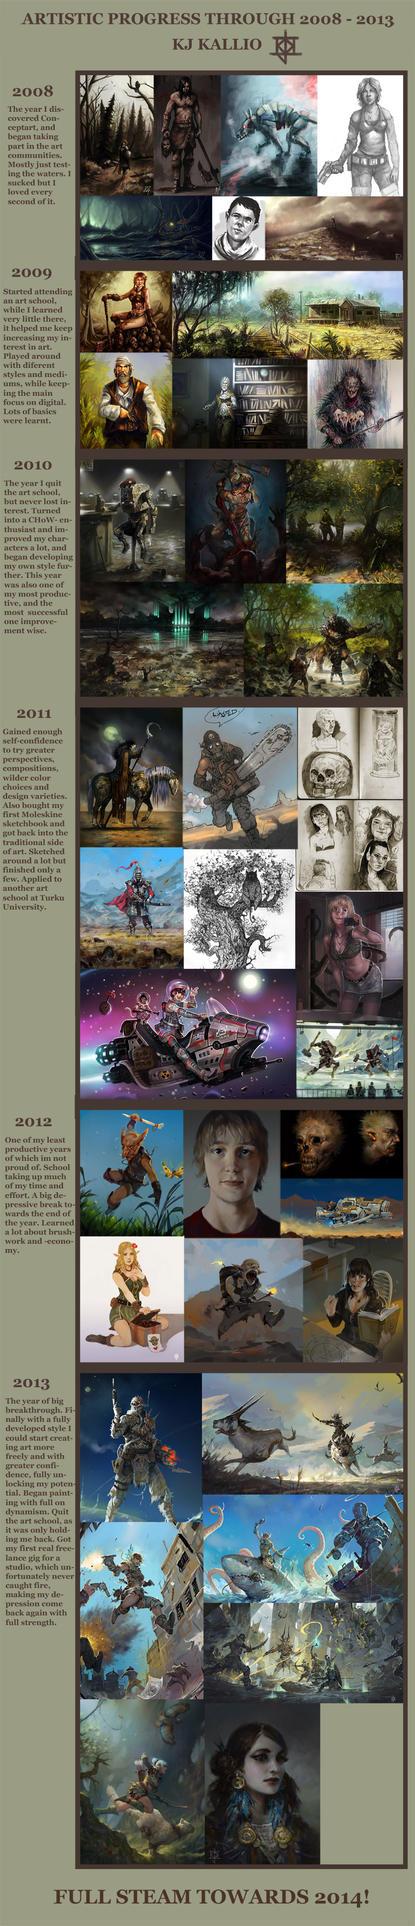 My artistic journey through 2008-2013 by KJKallio